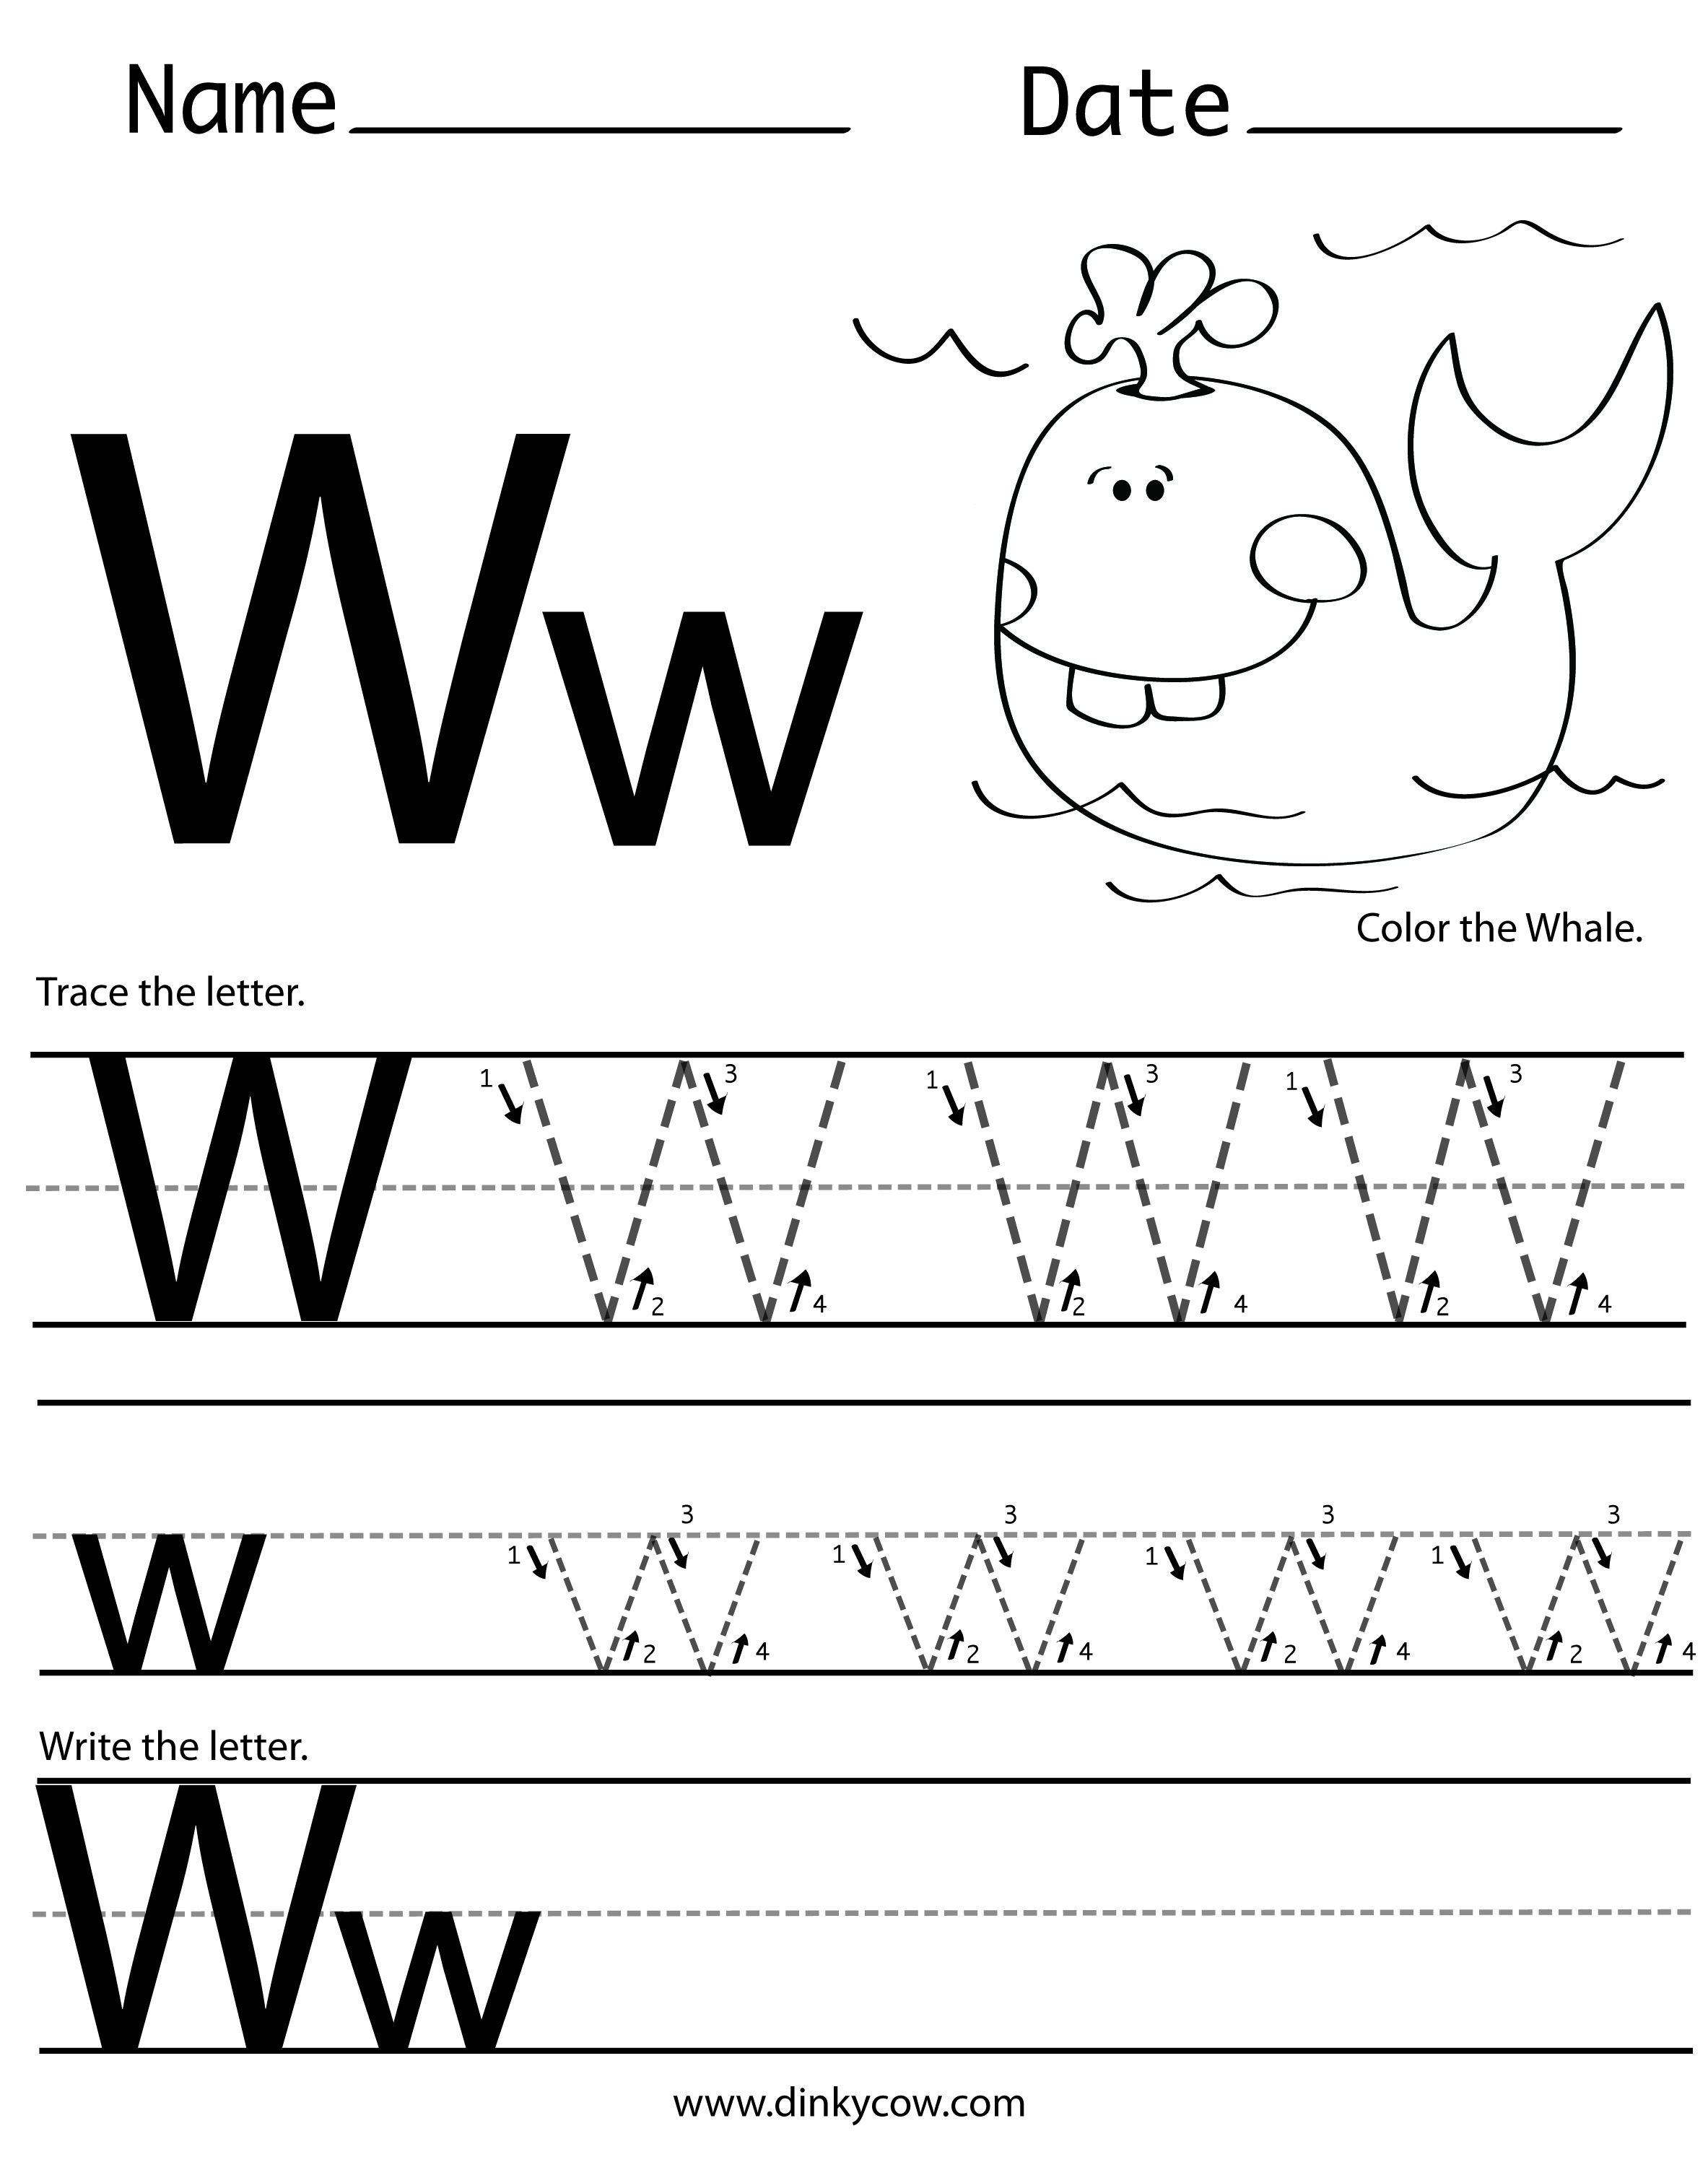 Worksheet Jolly Phonics Handwriting Worksheets Carlos Lomas